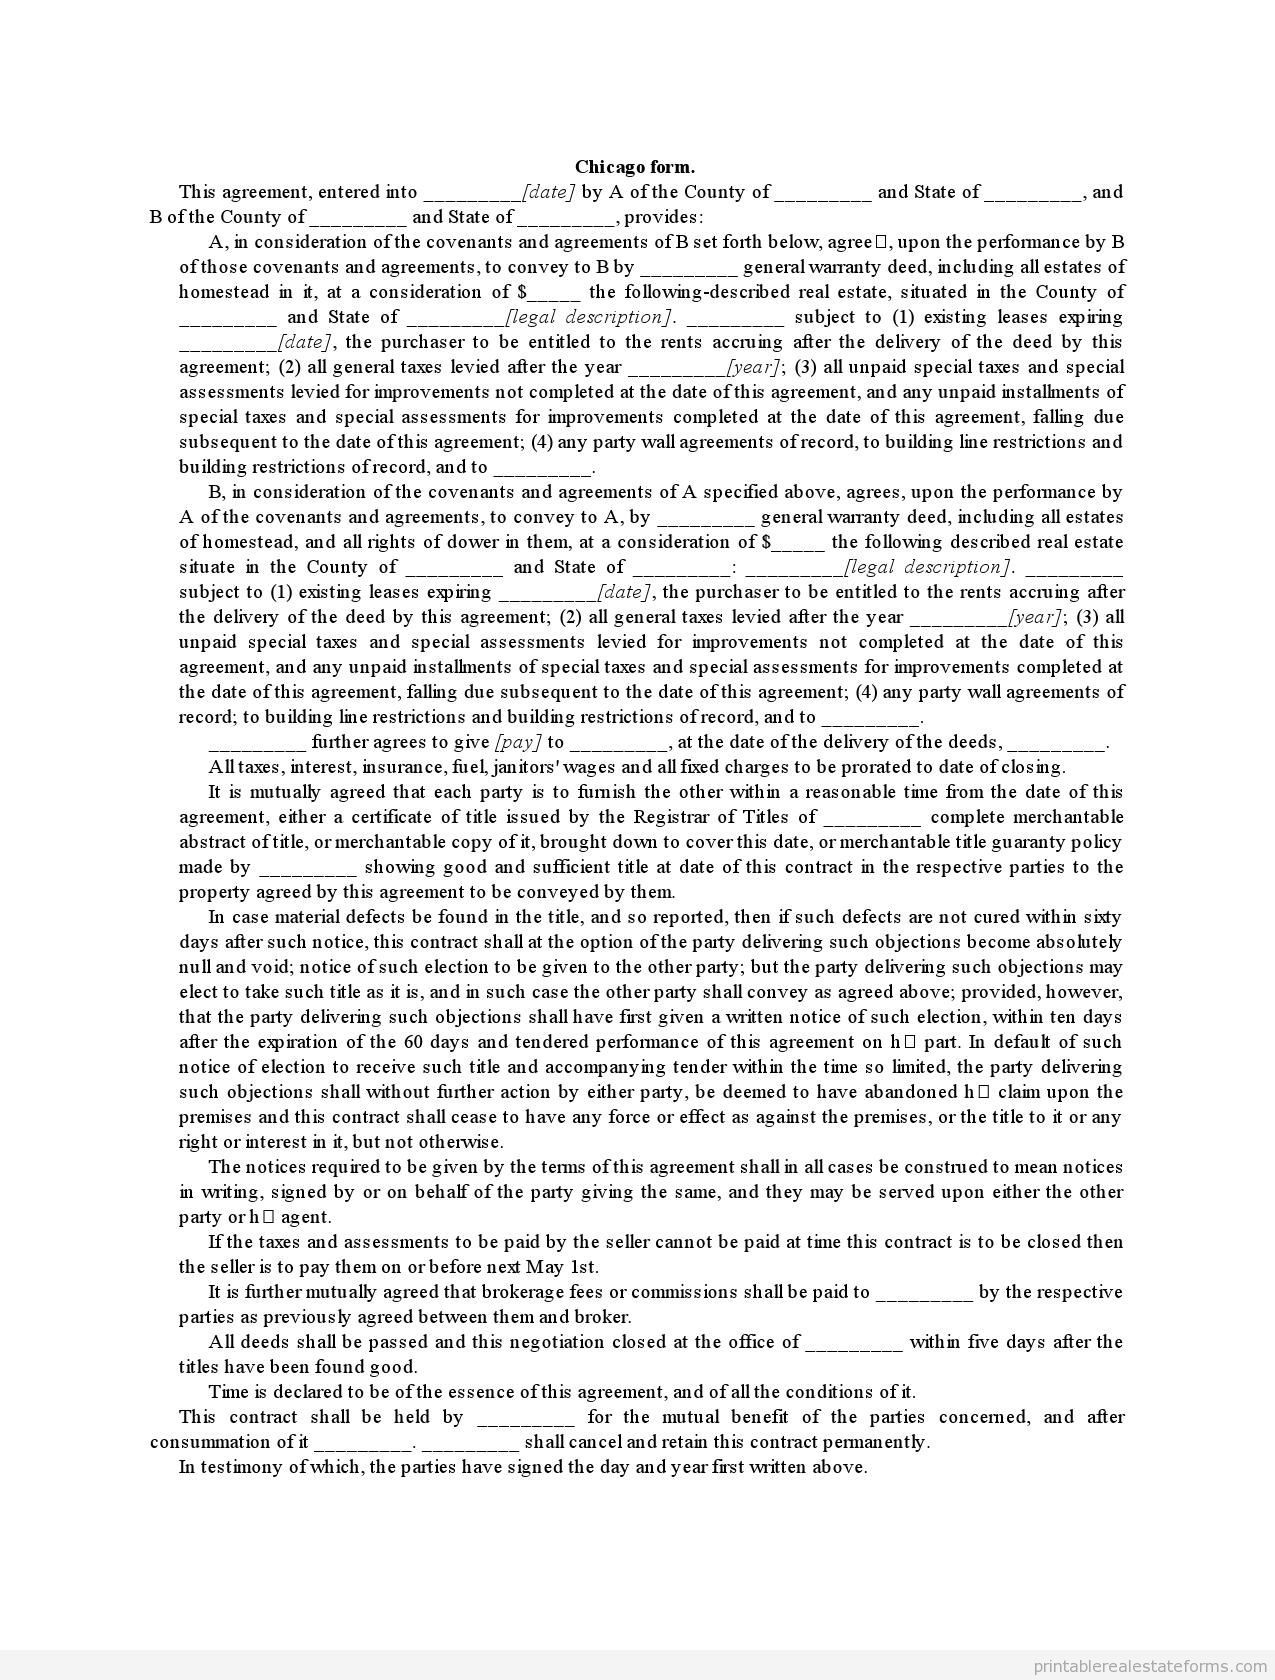 Sample Printable Chicago Form Form